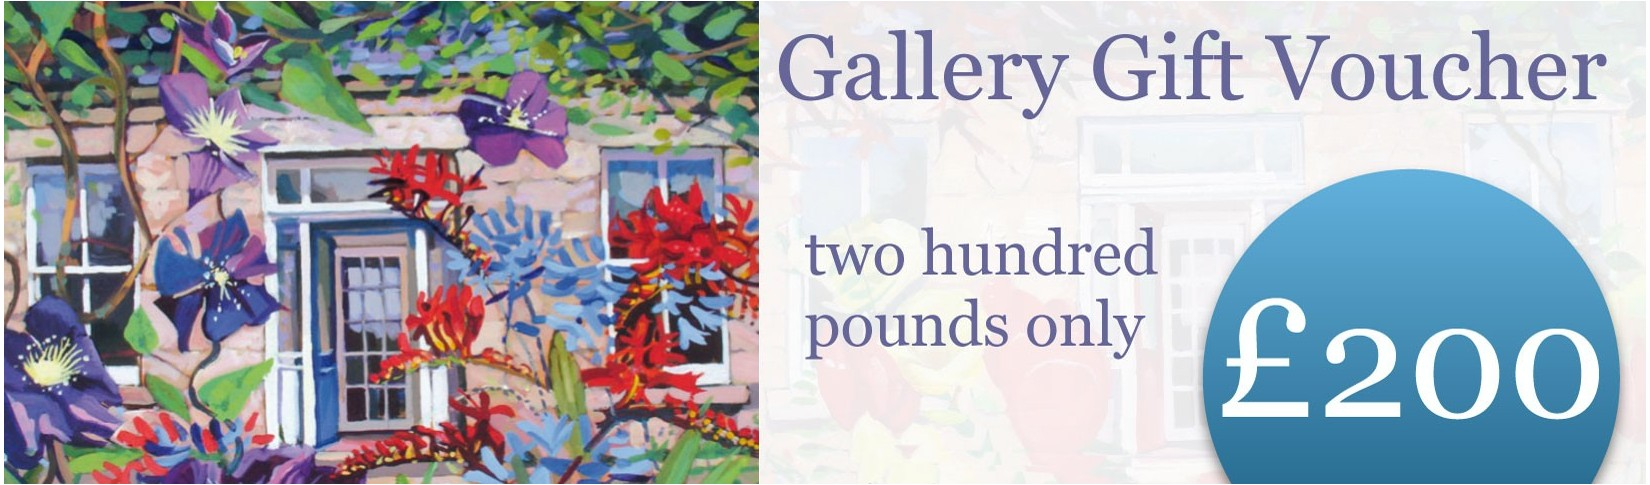 Tolquhon Art Gallery Gift Vouchers